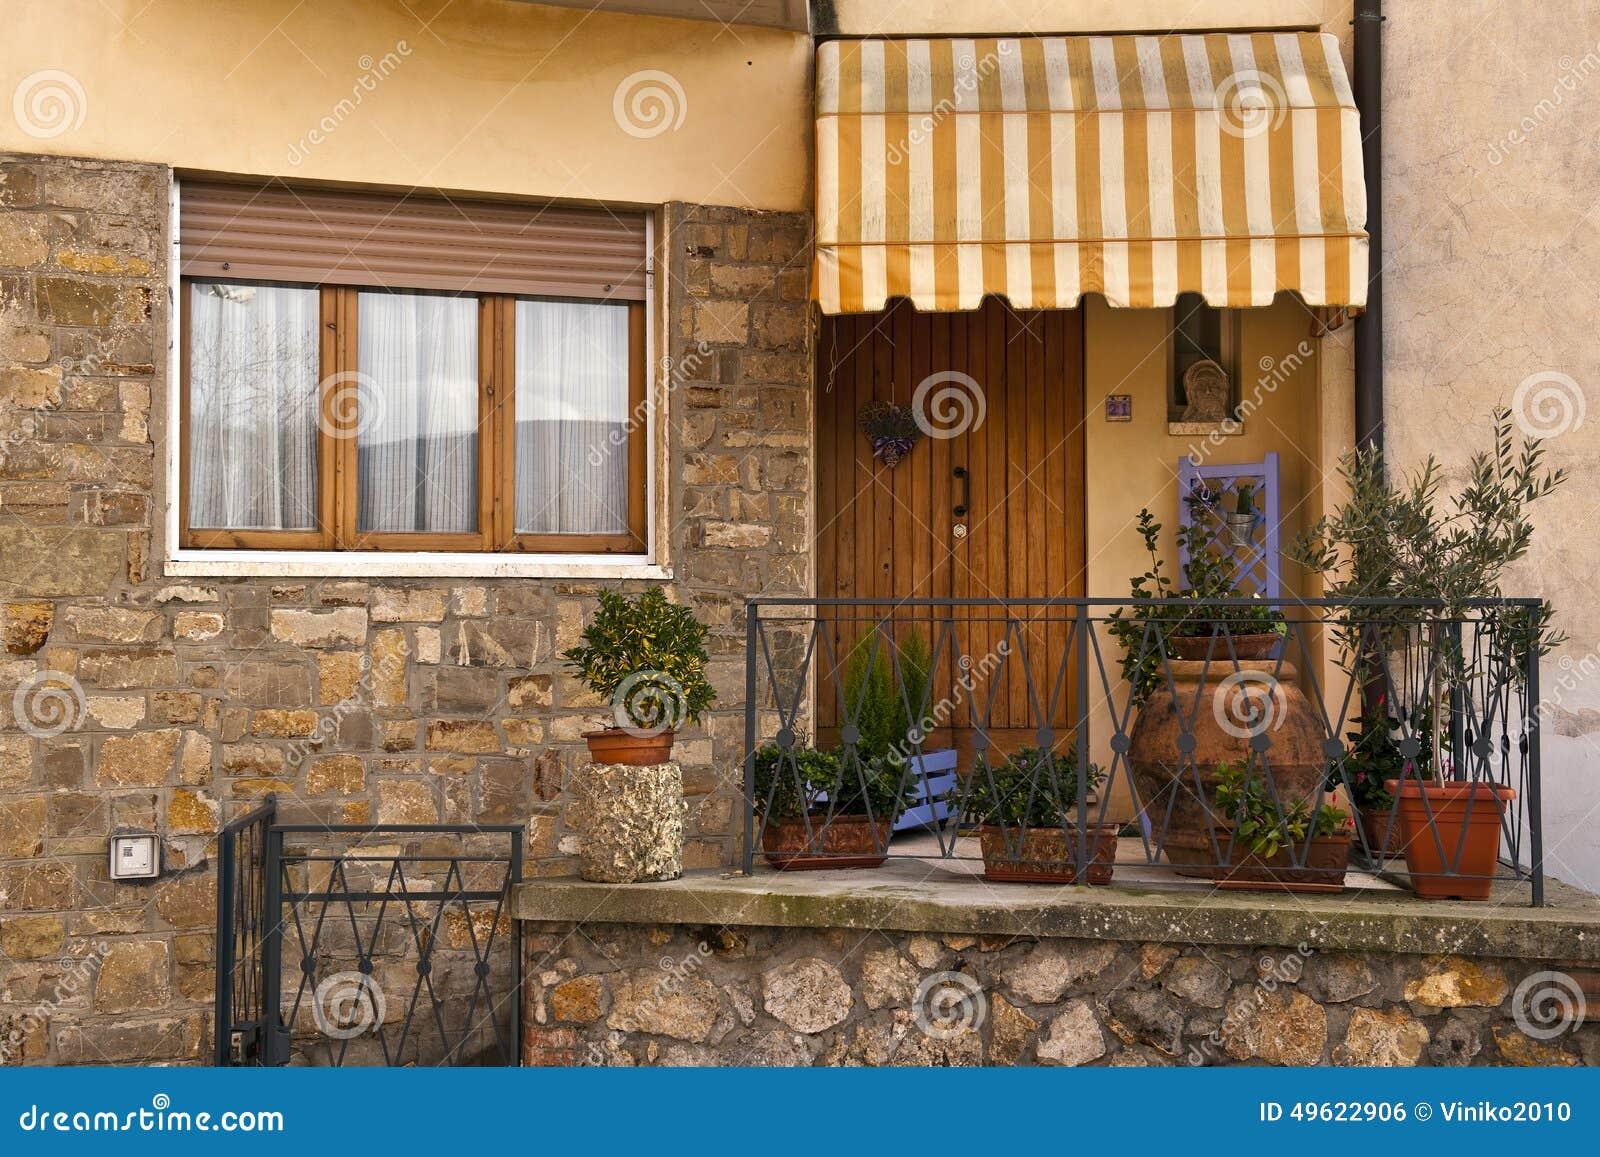 Traditional italian home stock photo image 49622906 for Italianhouse